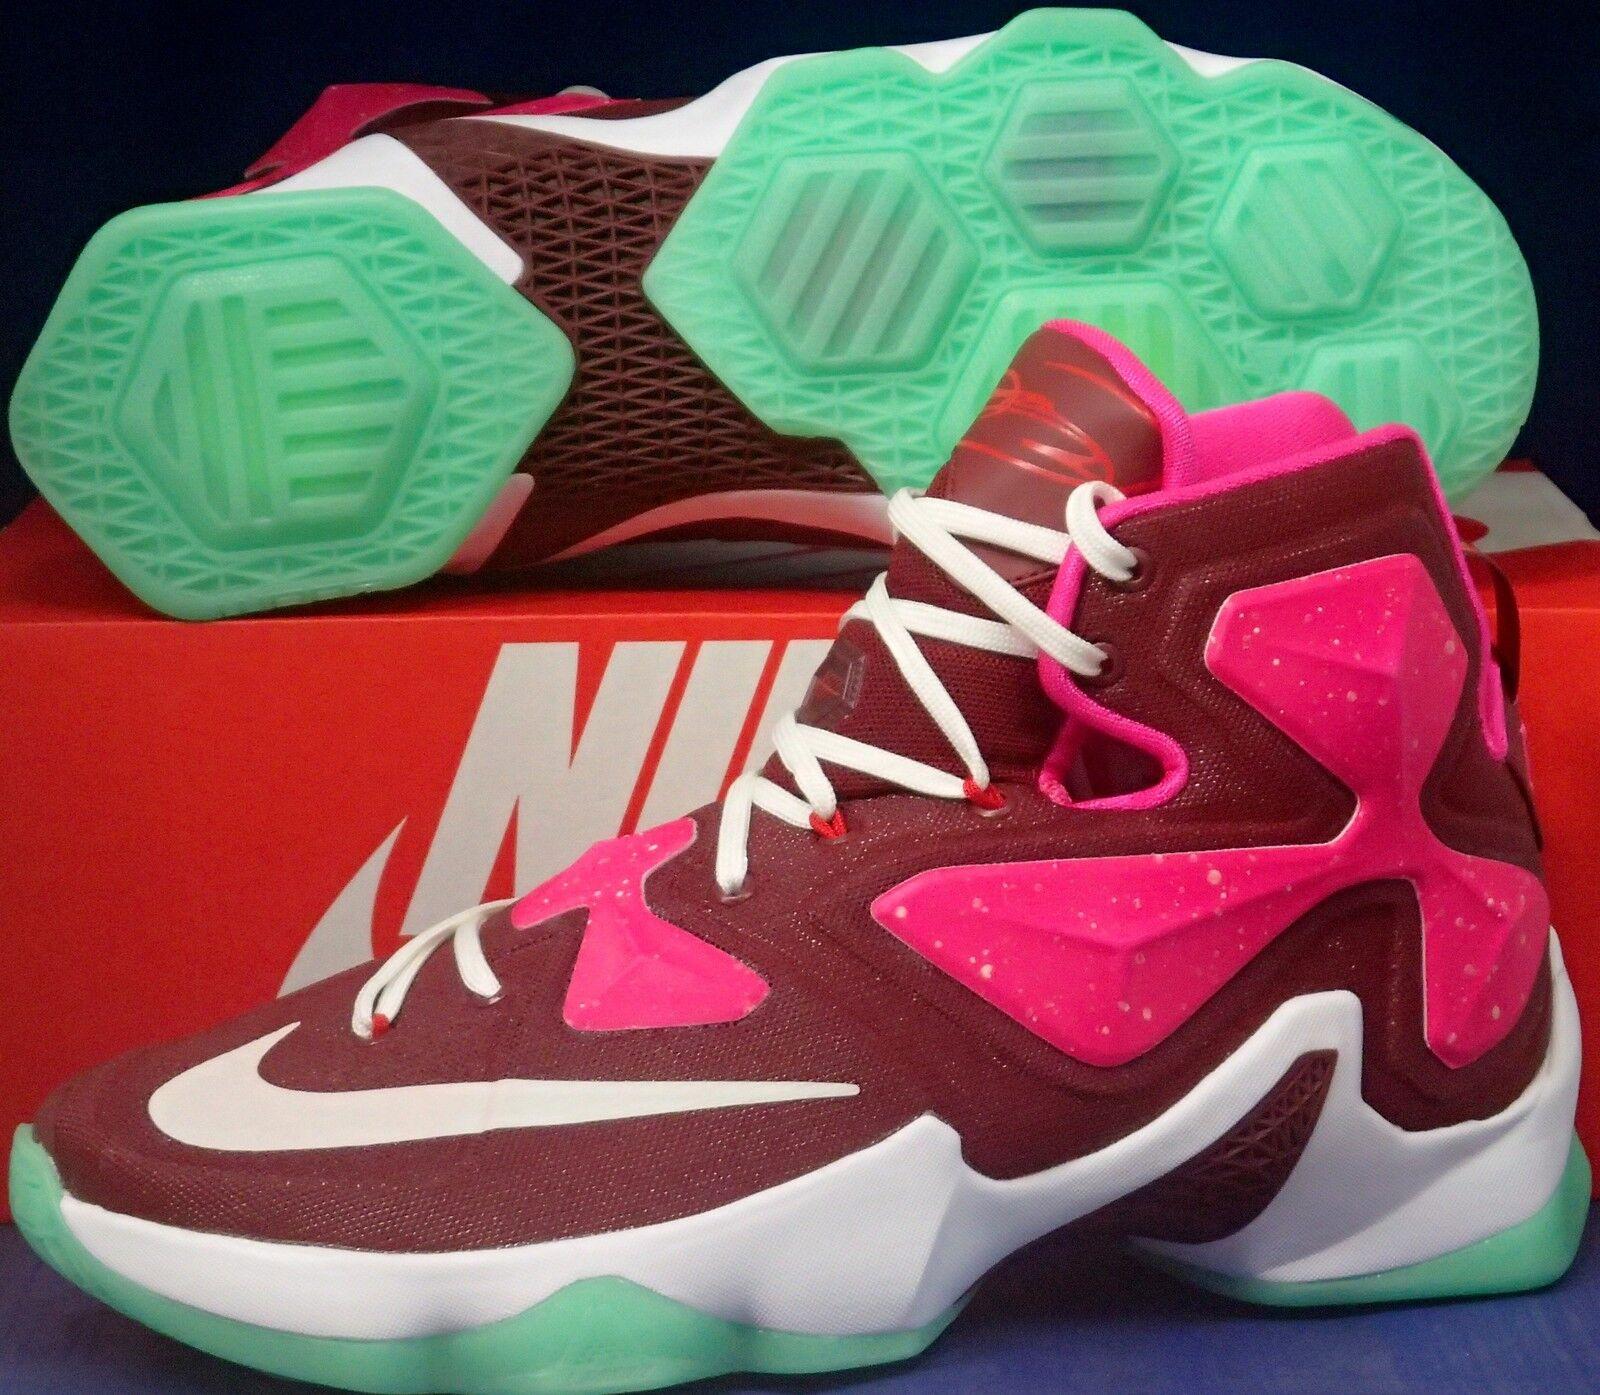 Nike Lebron XIII 13 iD Gym Red Fire Pink White Green SZ 9 ( 836141-992 )